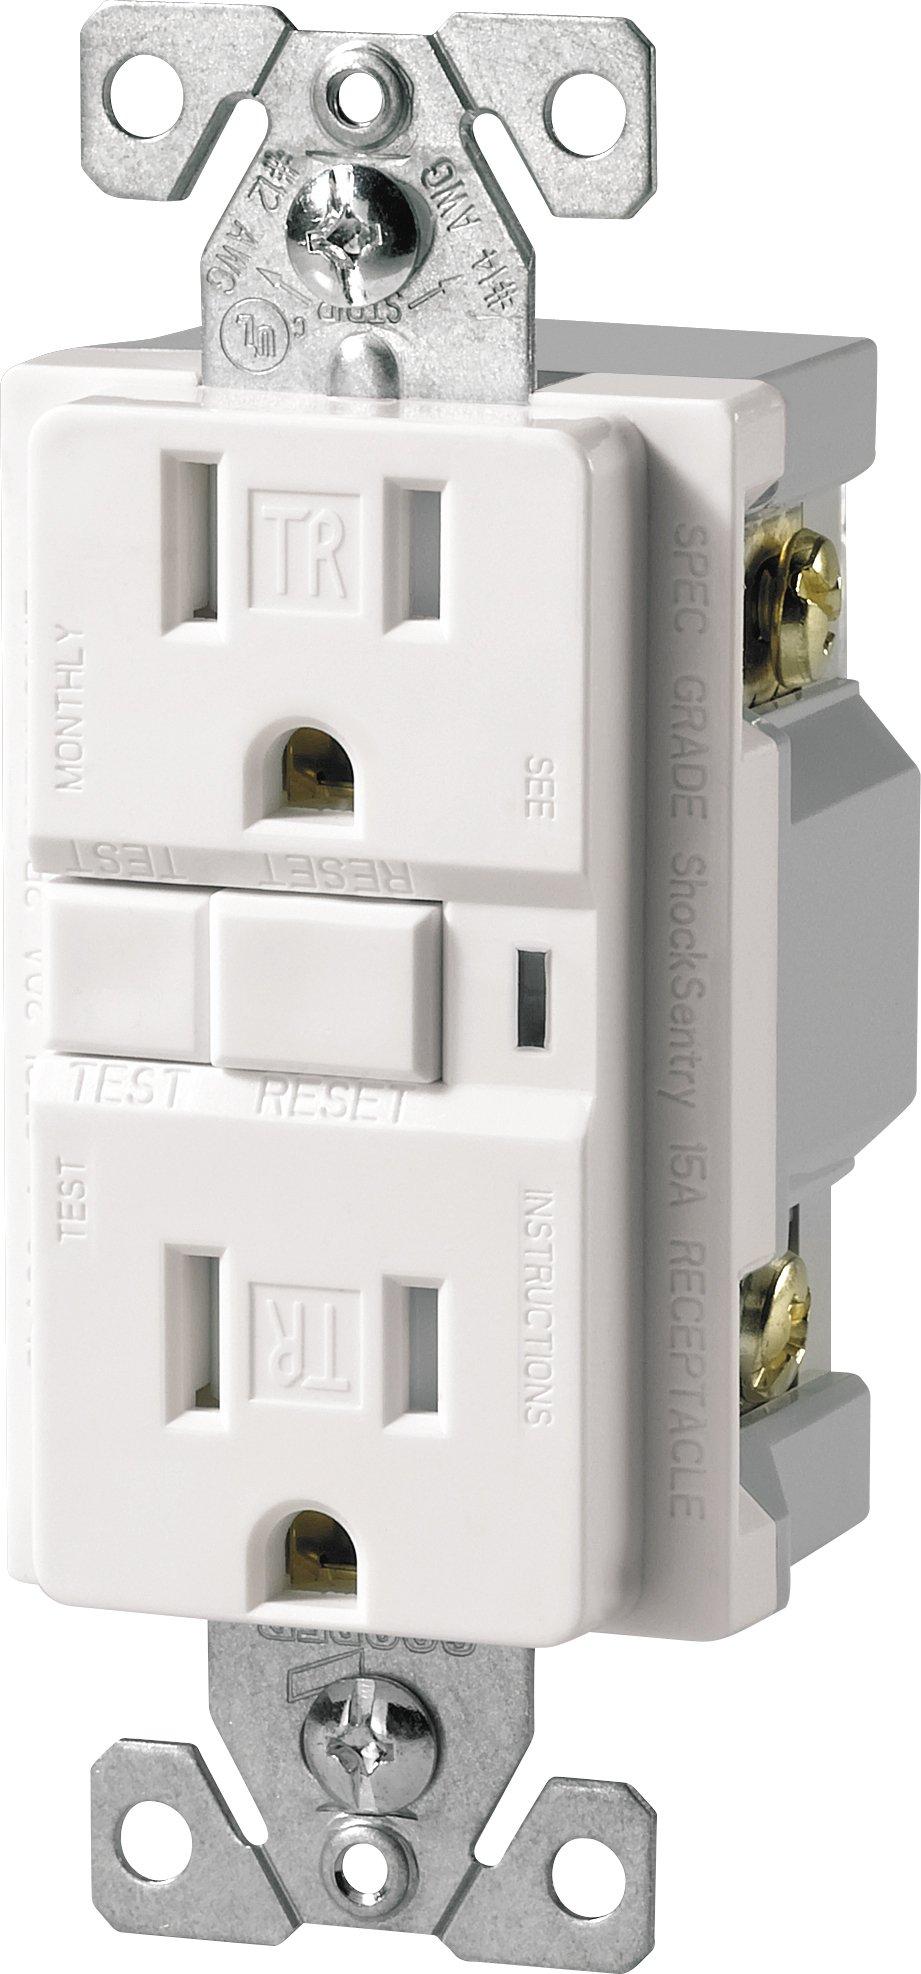 Eaton TRVGF15W Tamper Resistant GFCI Decorator Duplex Receptacle, White